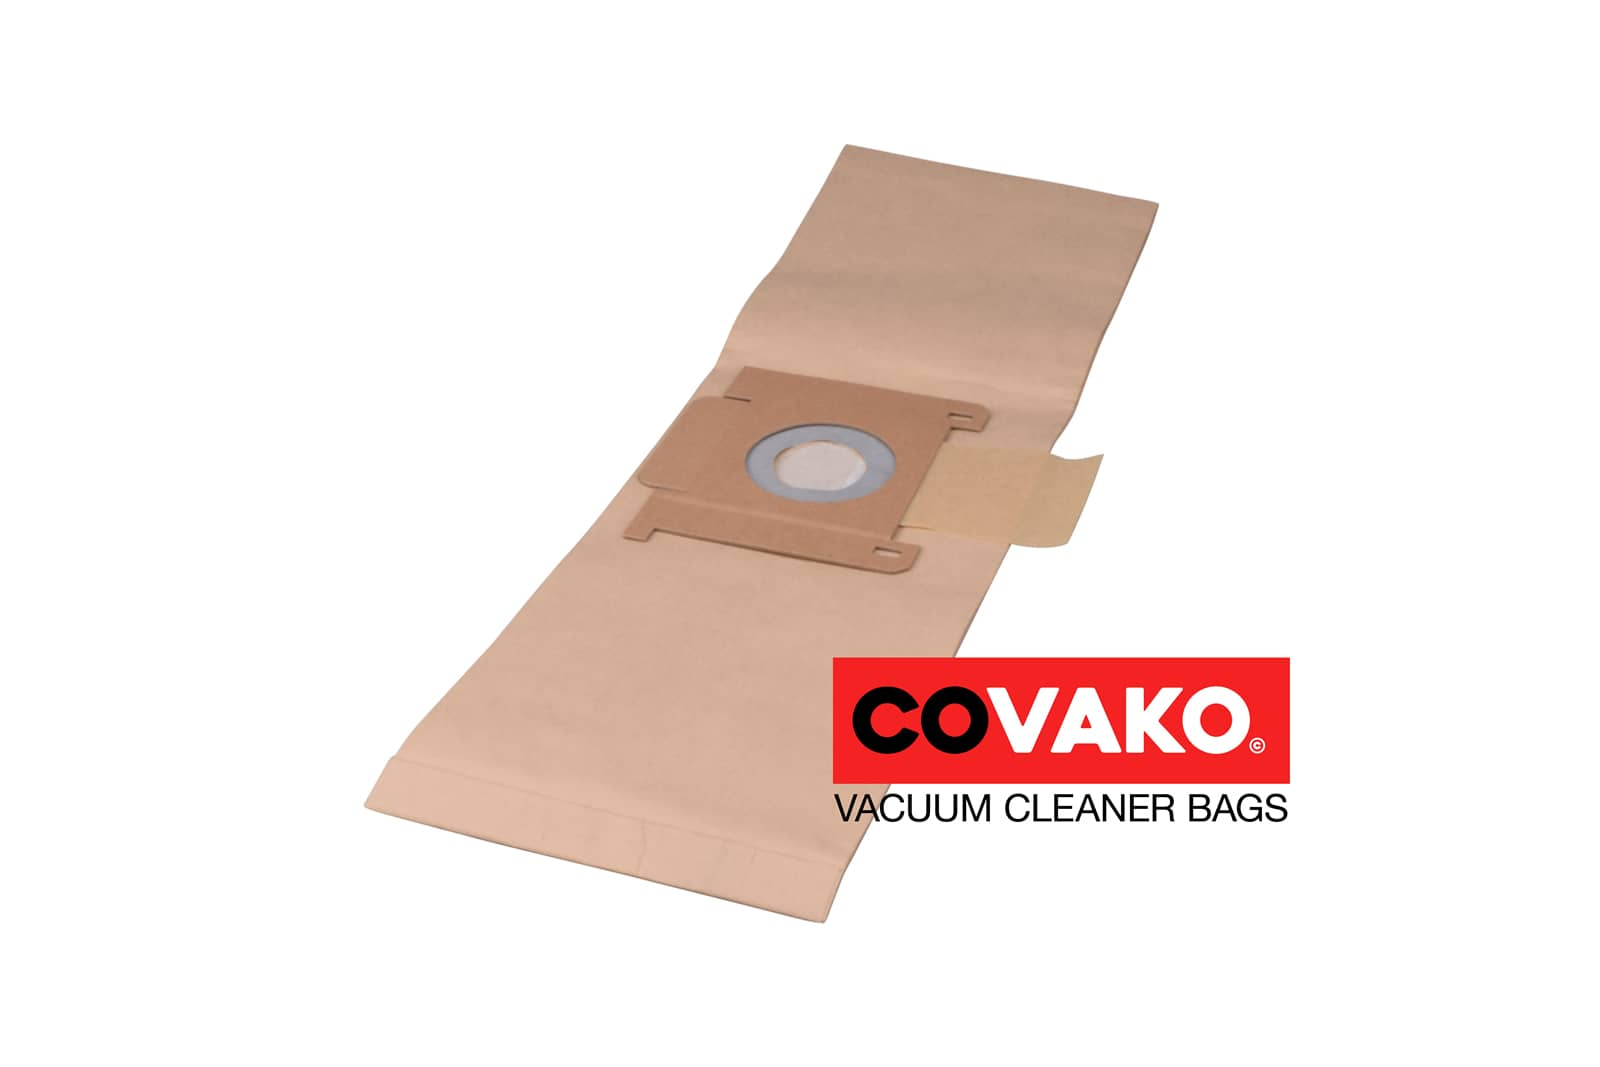 Clean a la Card C 5 / Paper - Clean a la Card vacuum cleaner bags